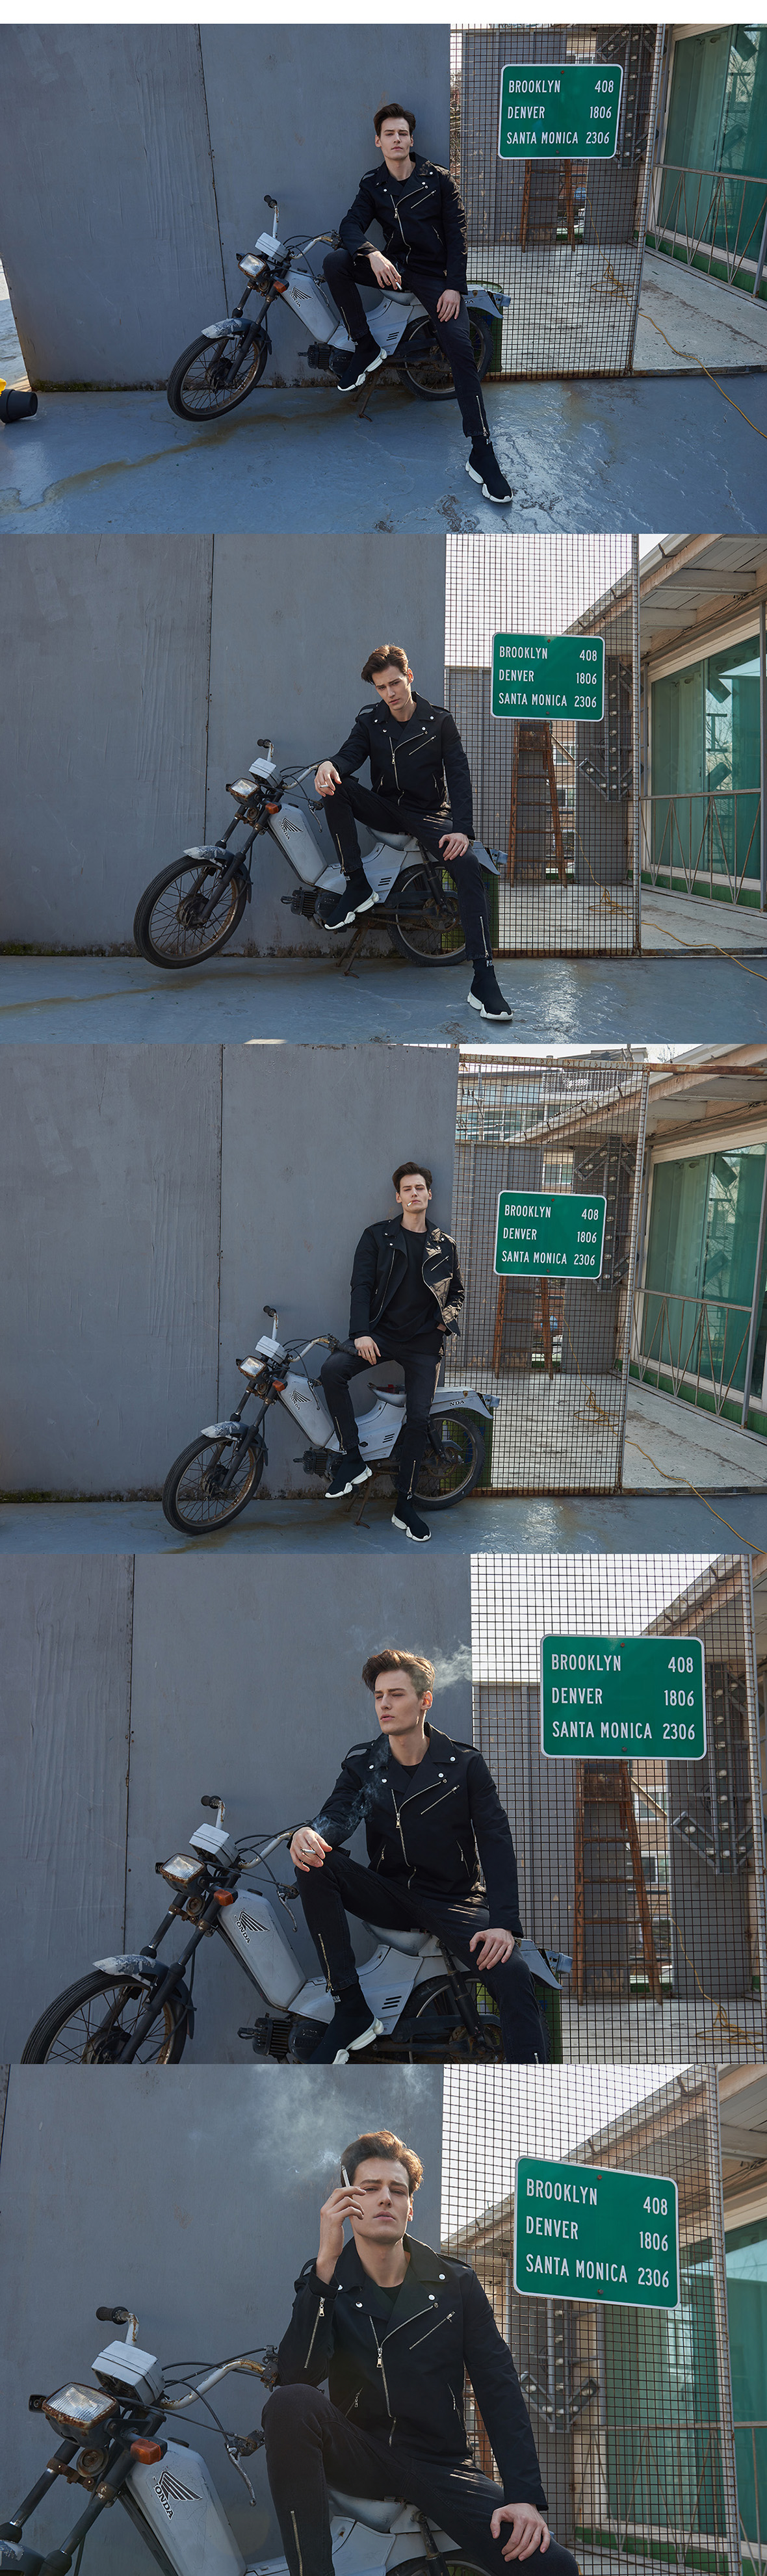 rider_black_detail_2.jpg